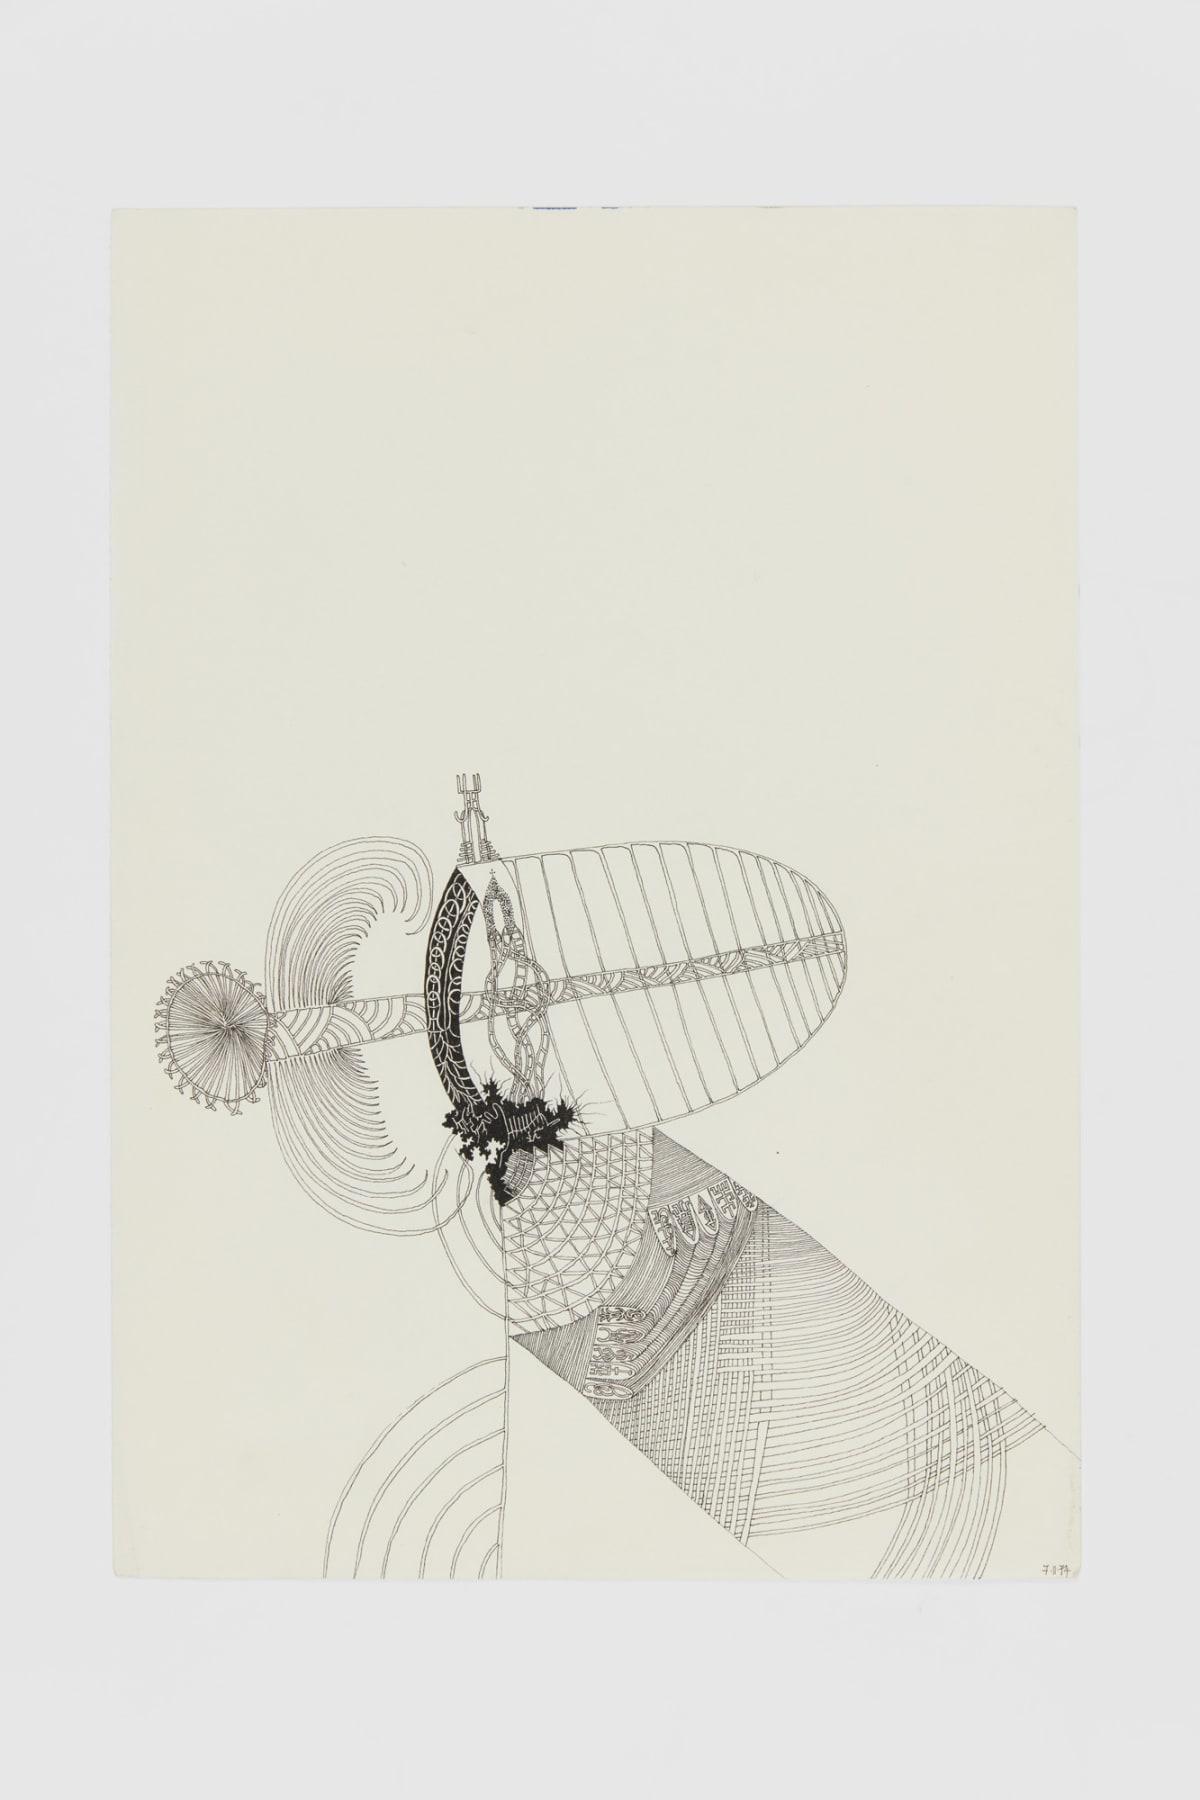 Ann CHURCHILL 7.11.74 (Daily drawings), 1974 Pen on paper 29.7 x 20.9 cm